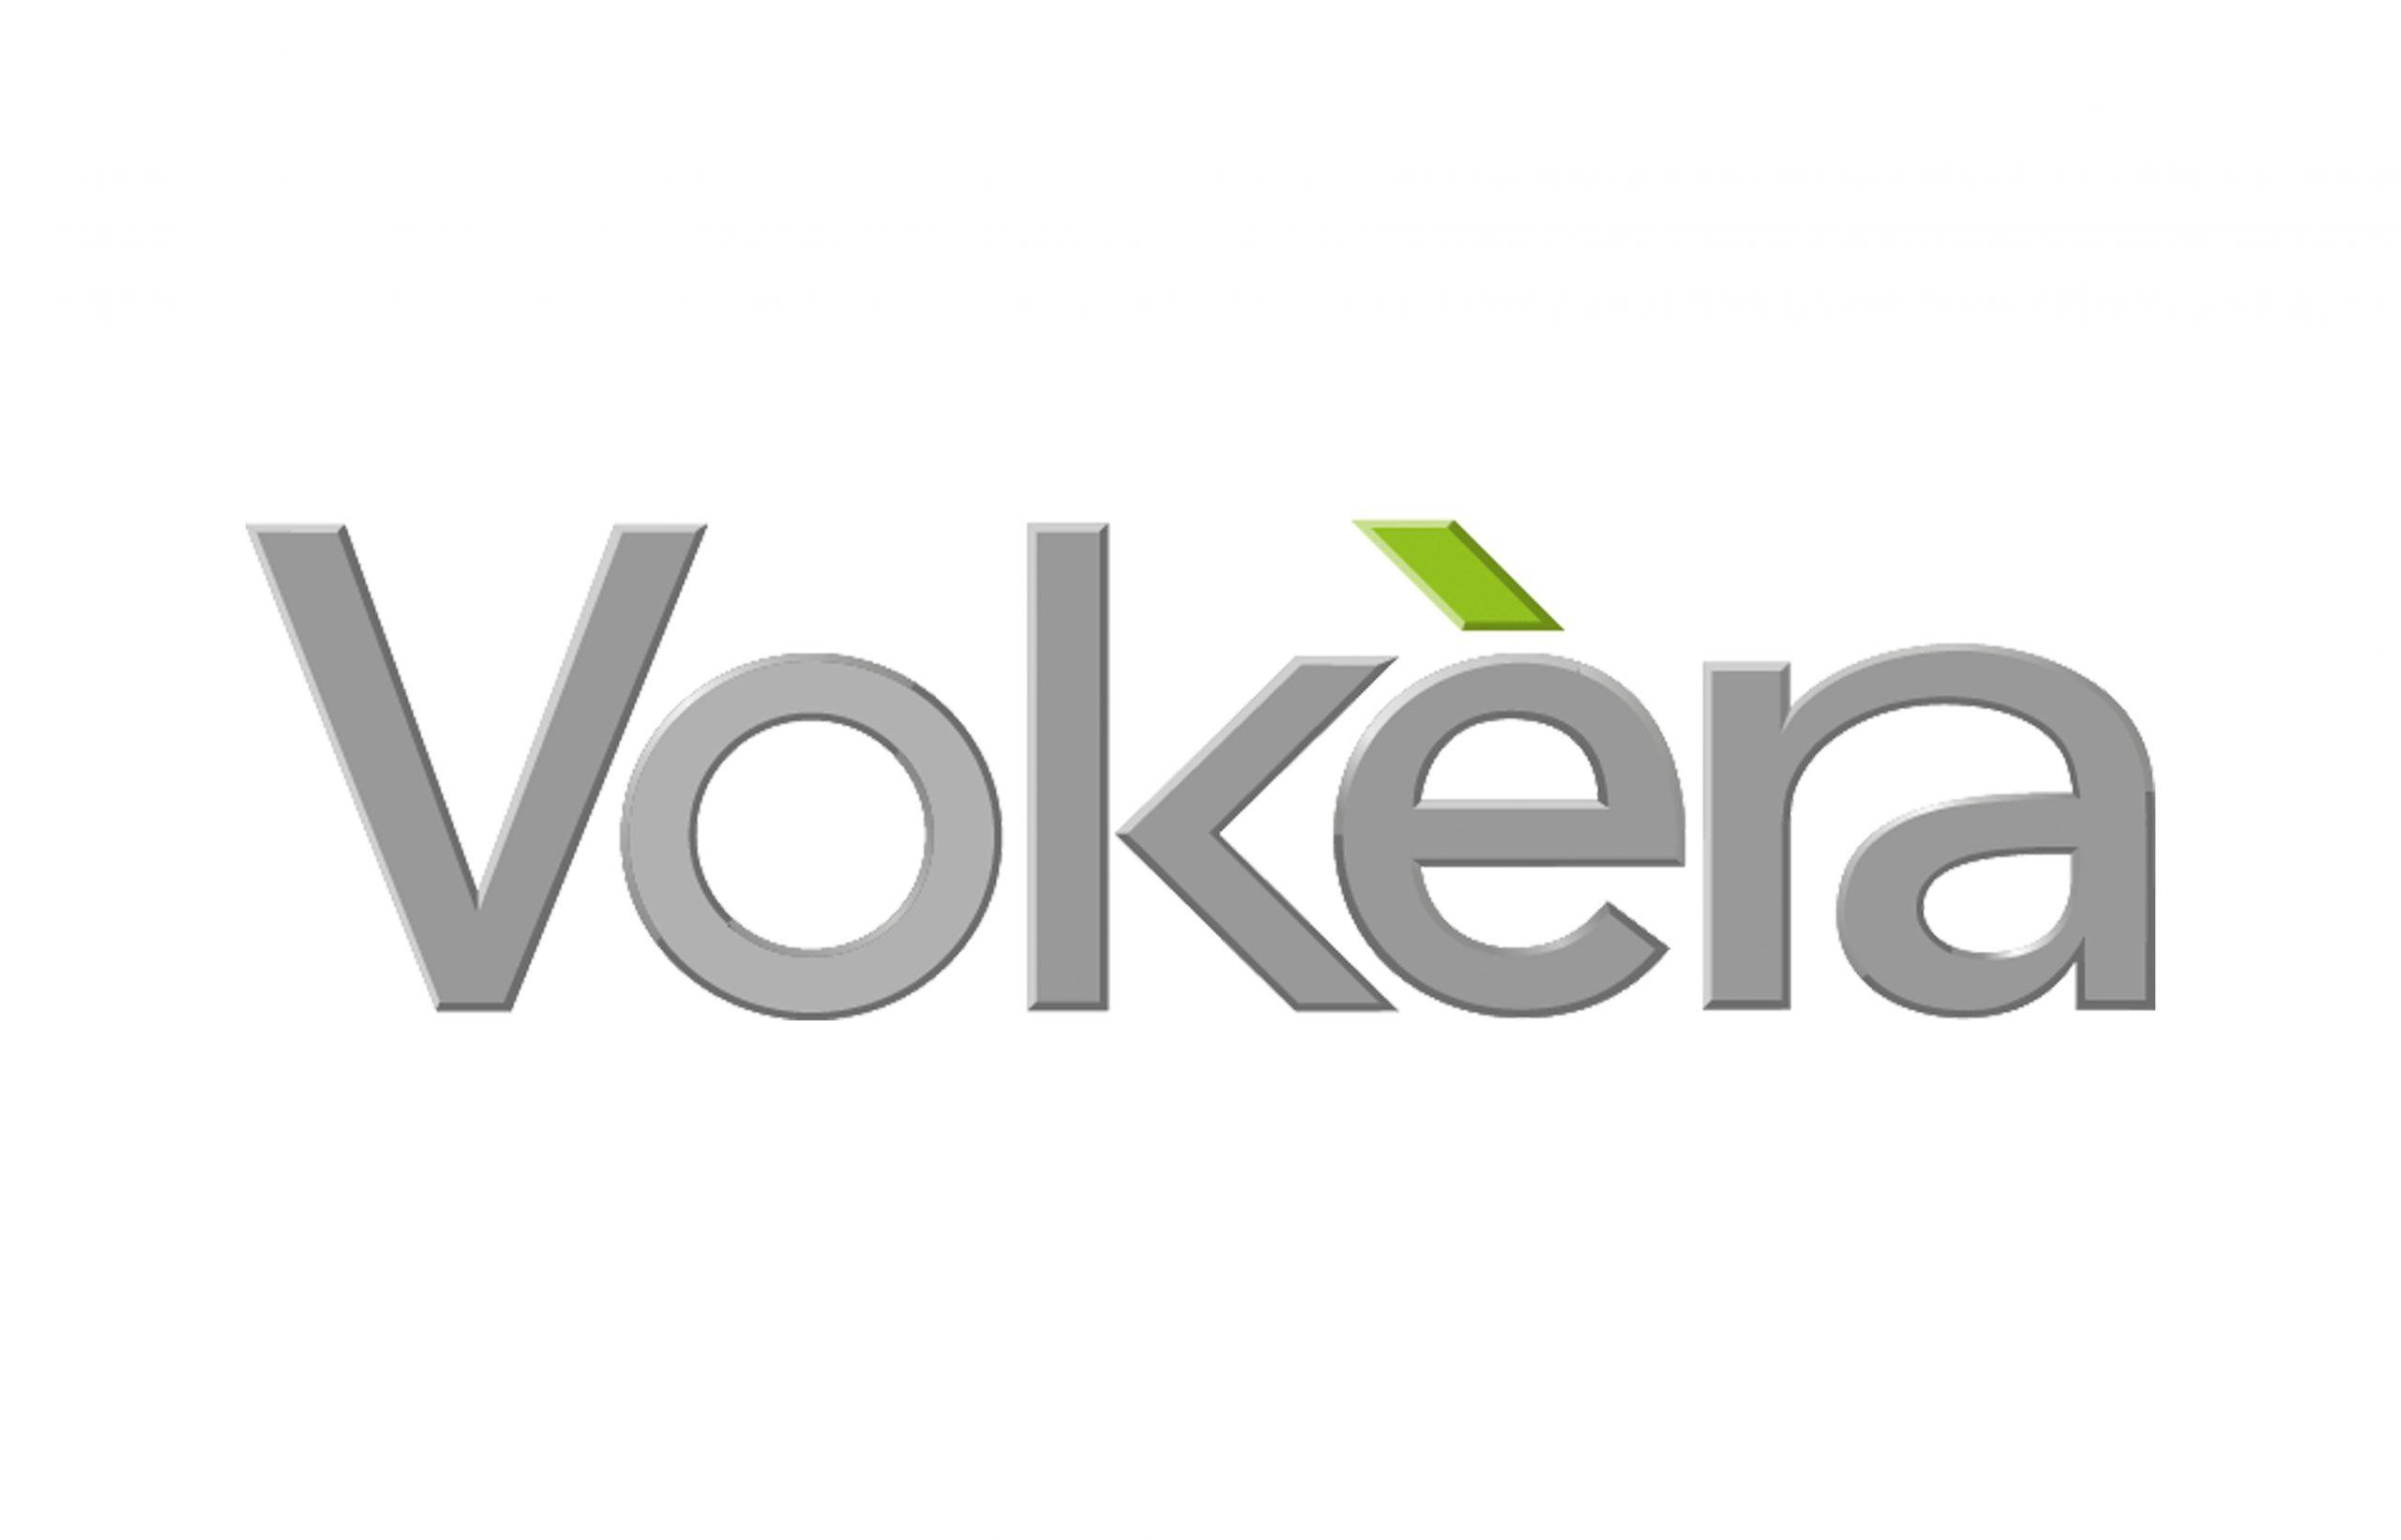 Volkera